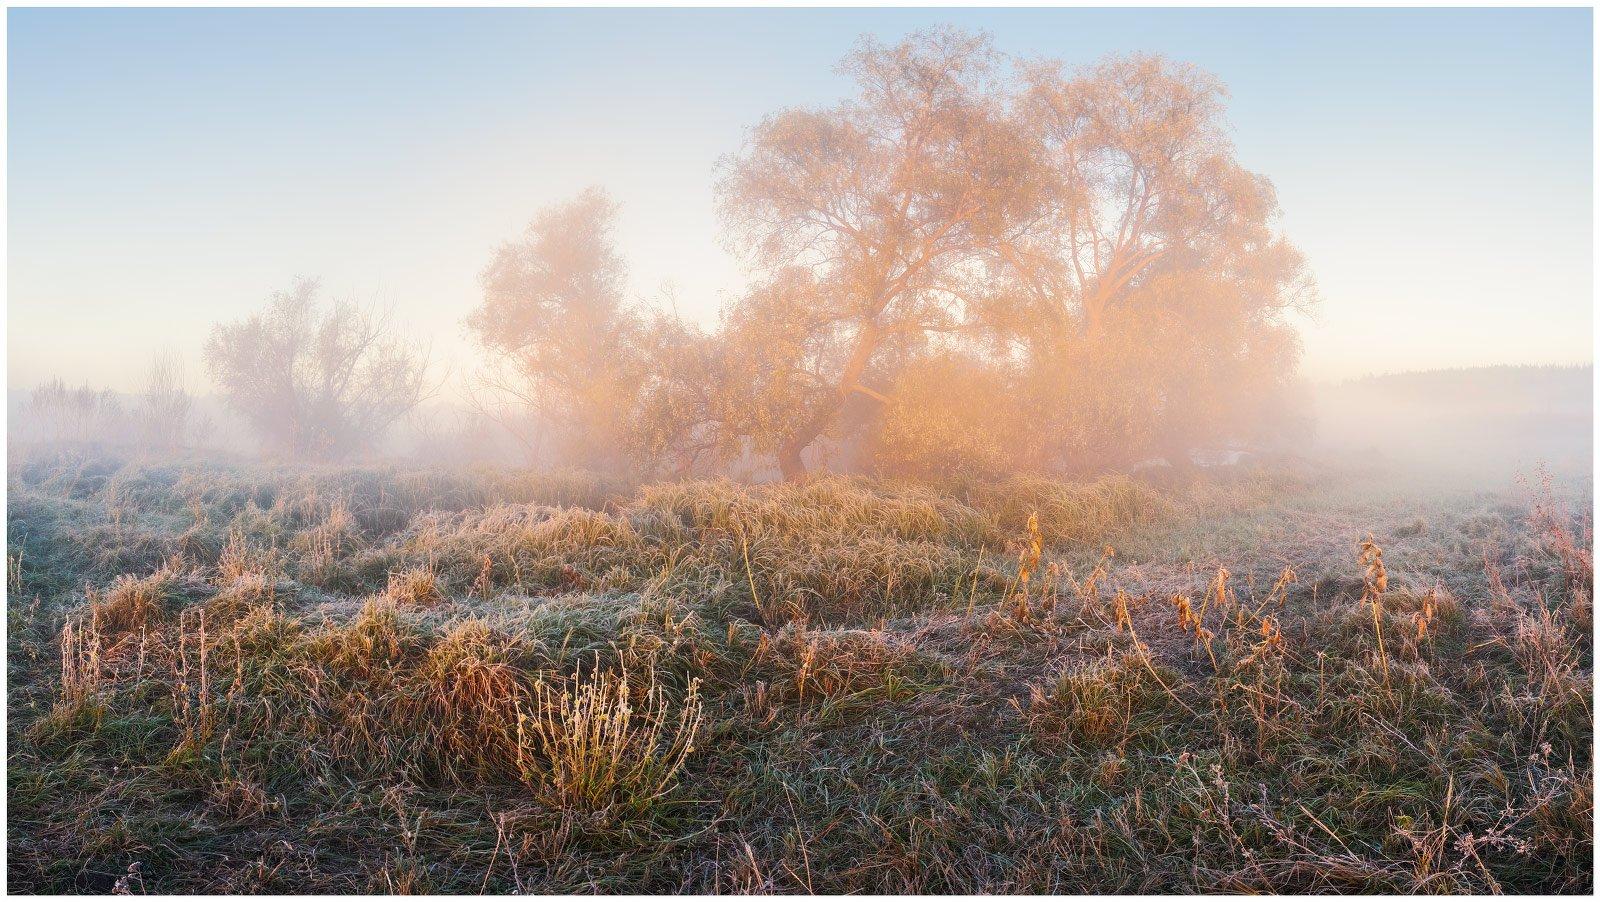 утро, туман, рассвет, осень, заморозок, изморозь, луг, Станислав Саламанов